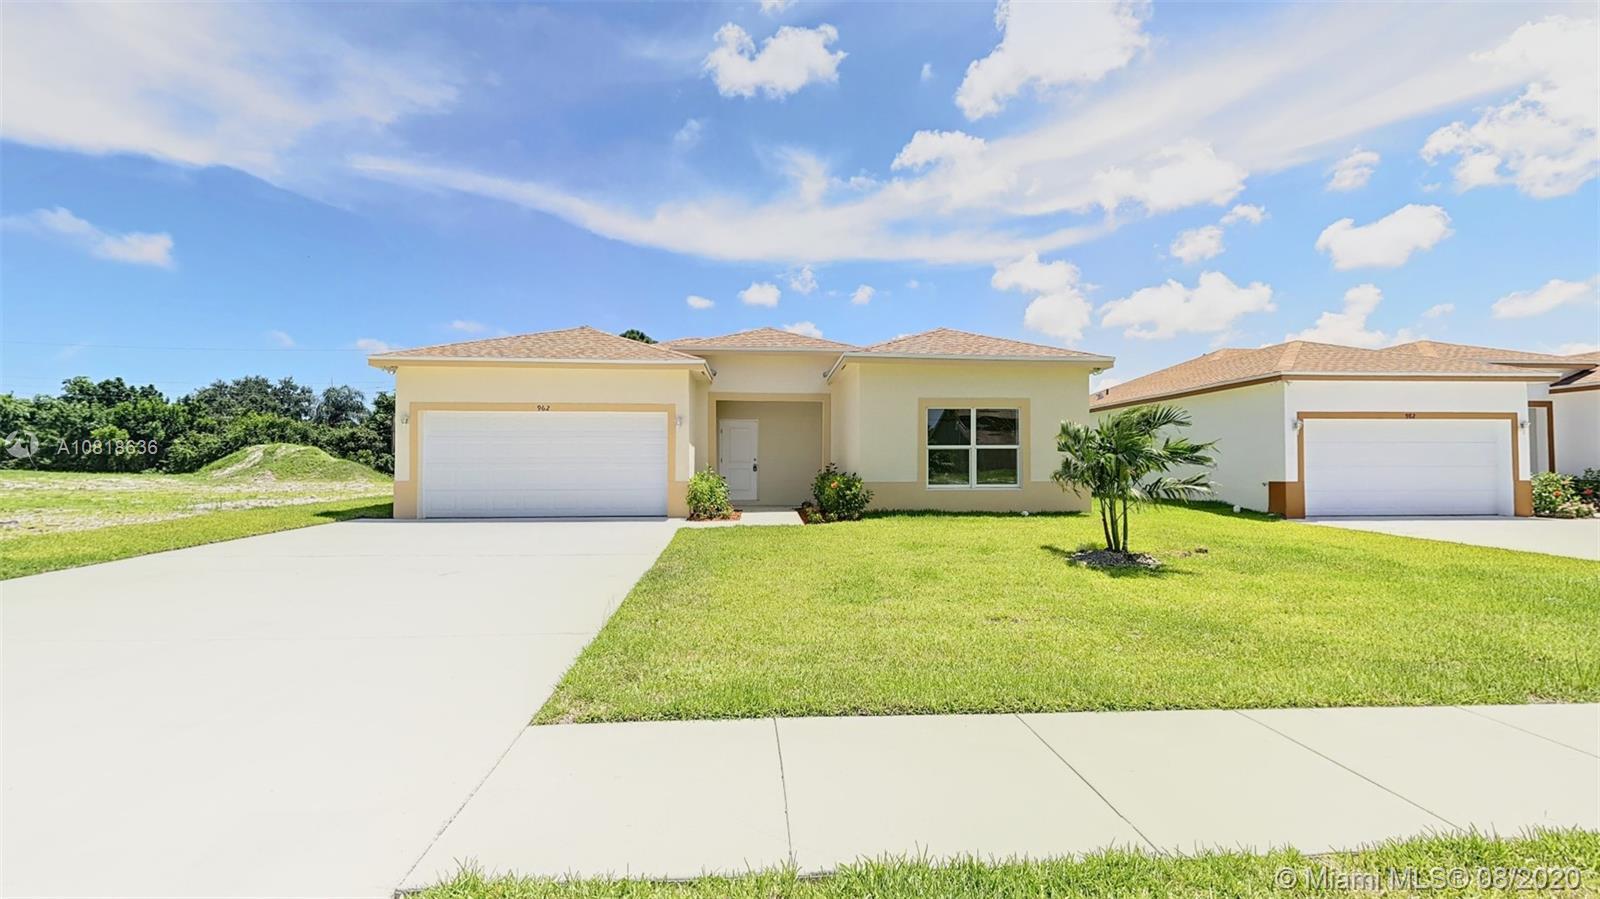 962 NW 9th Ave, Boynton Beach, FL 33426